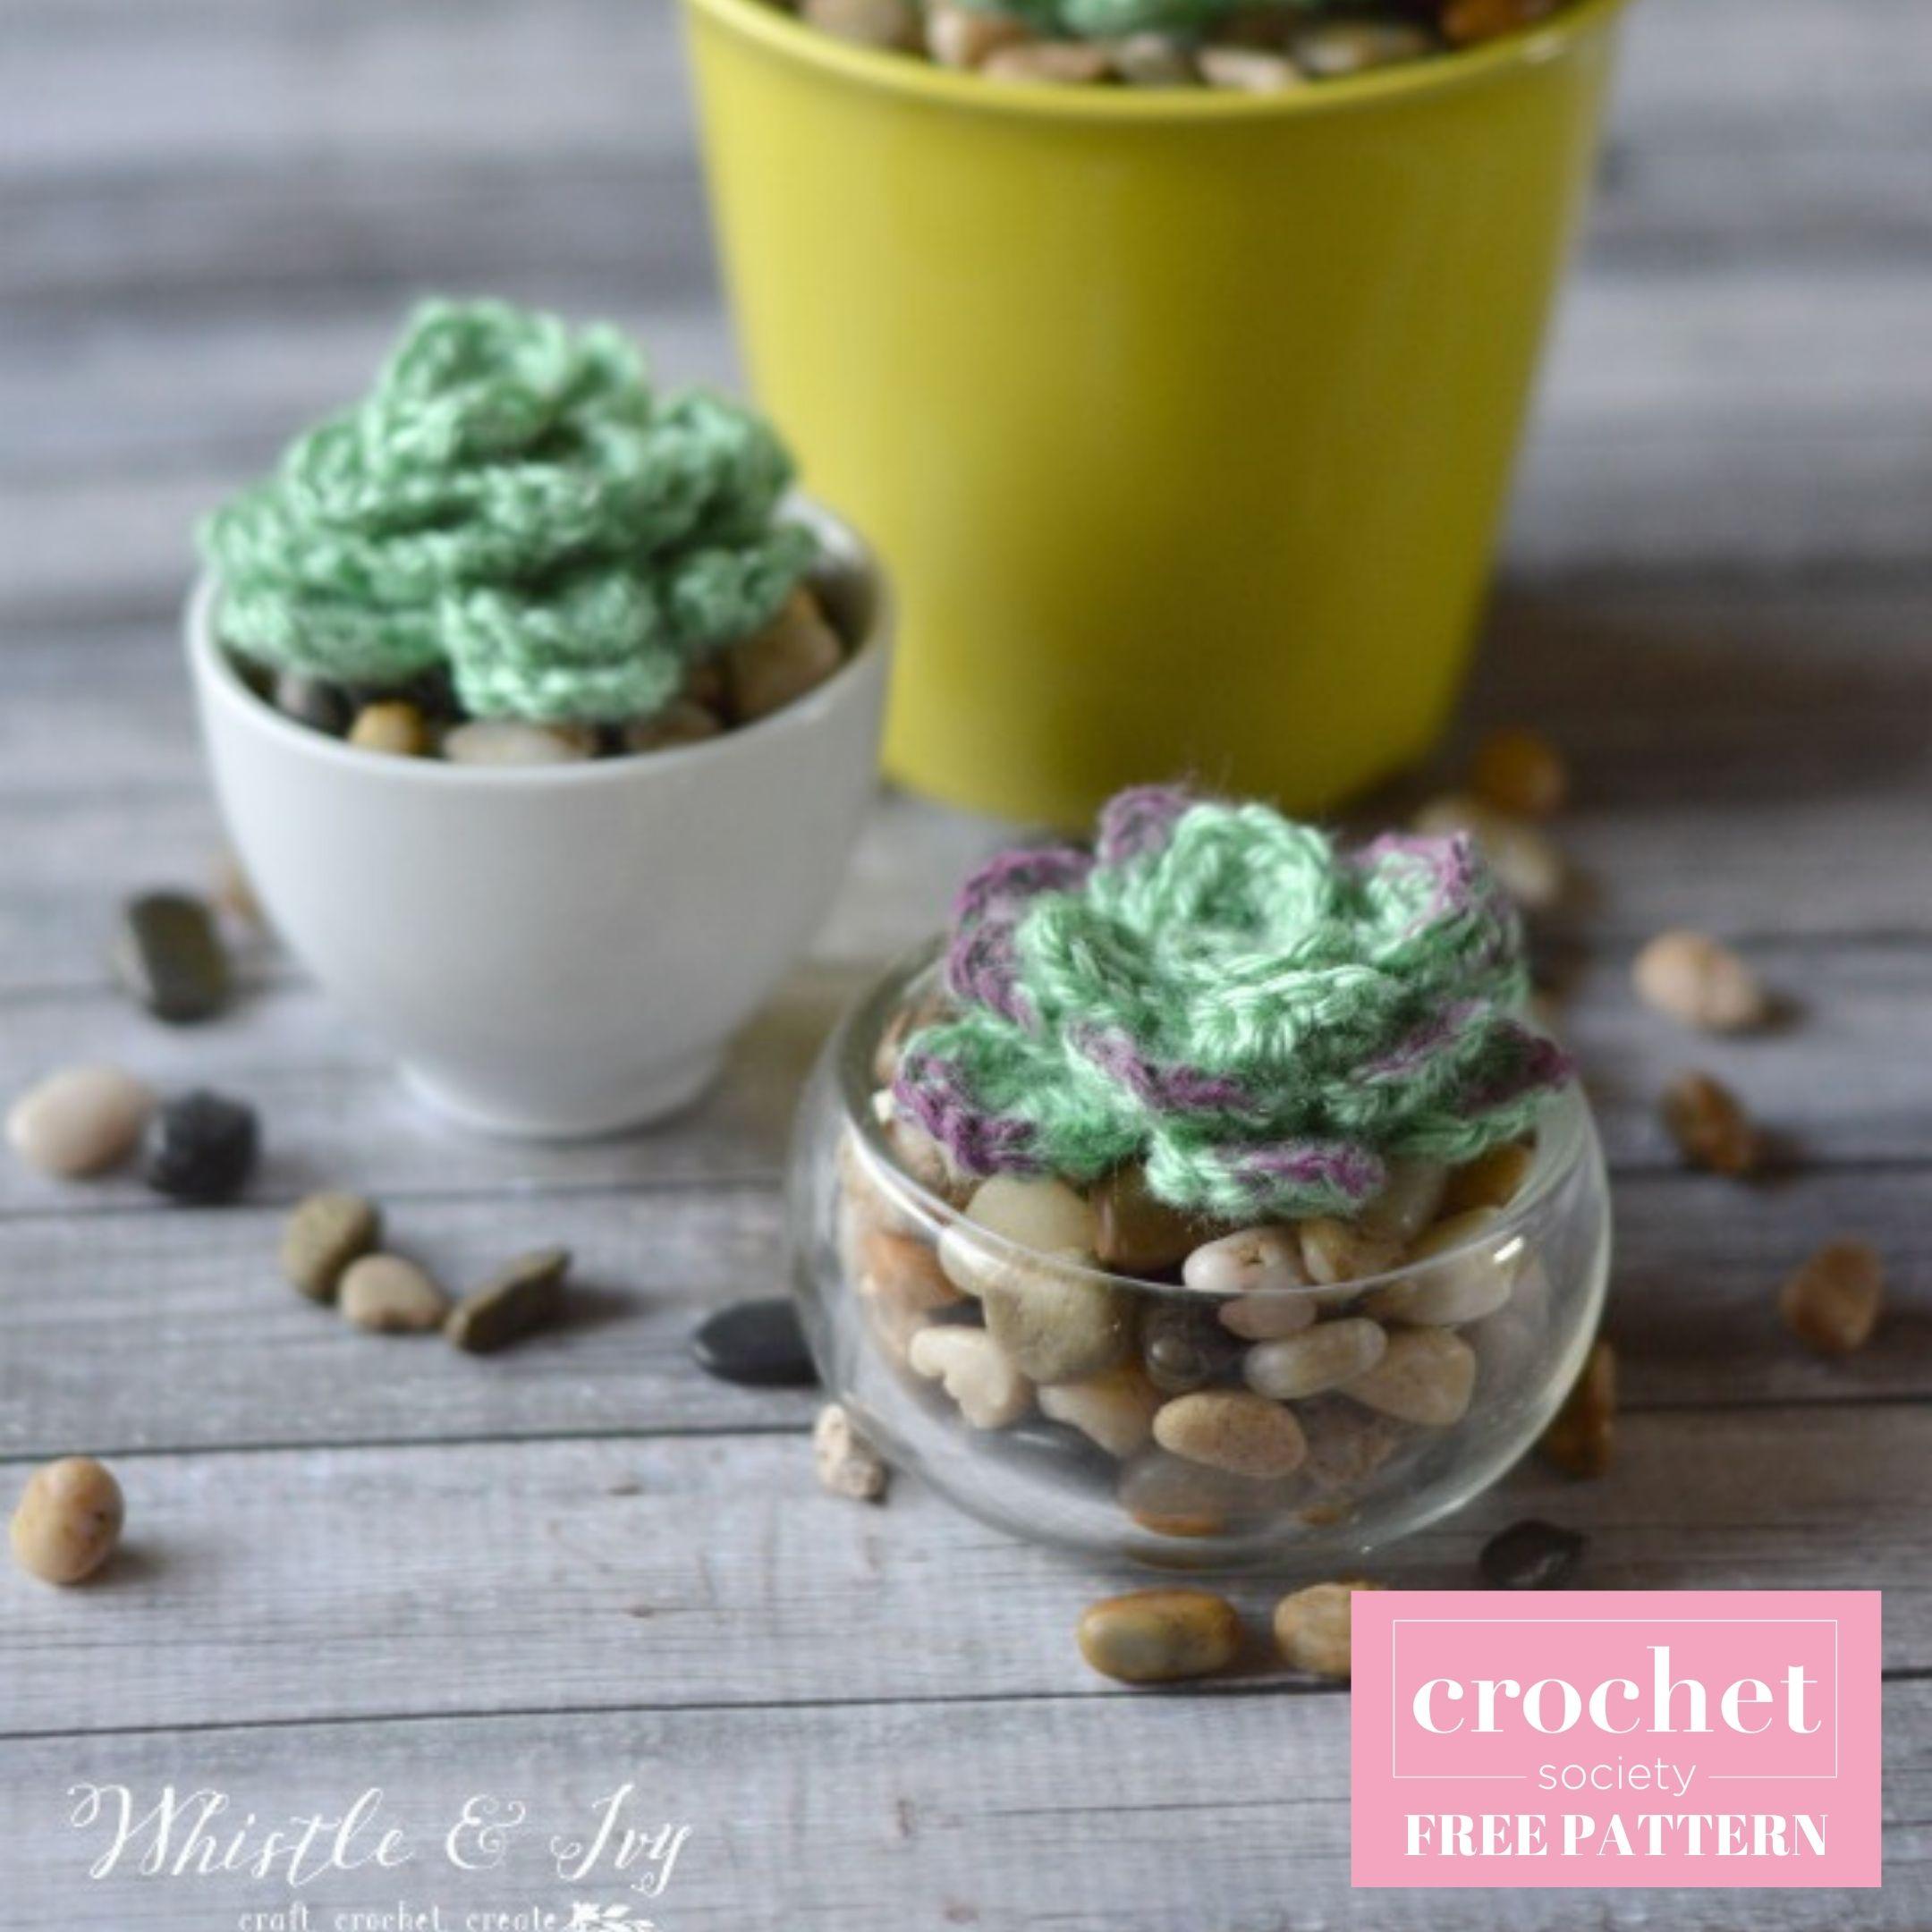 Succulent Crochet Pattern